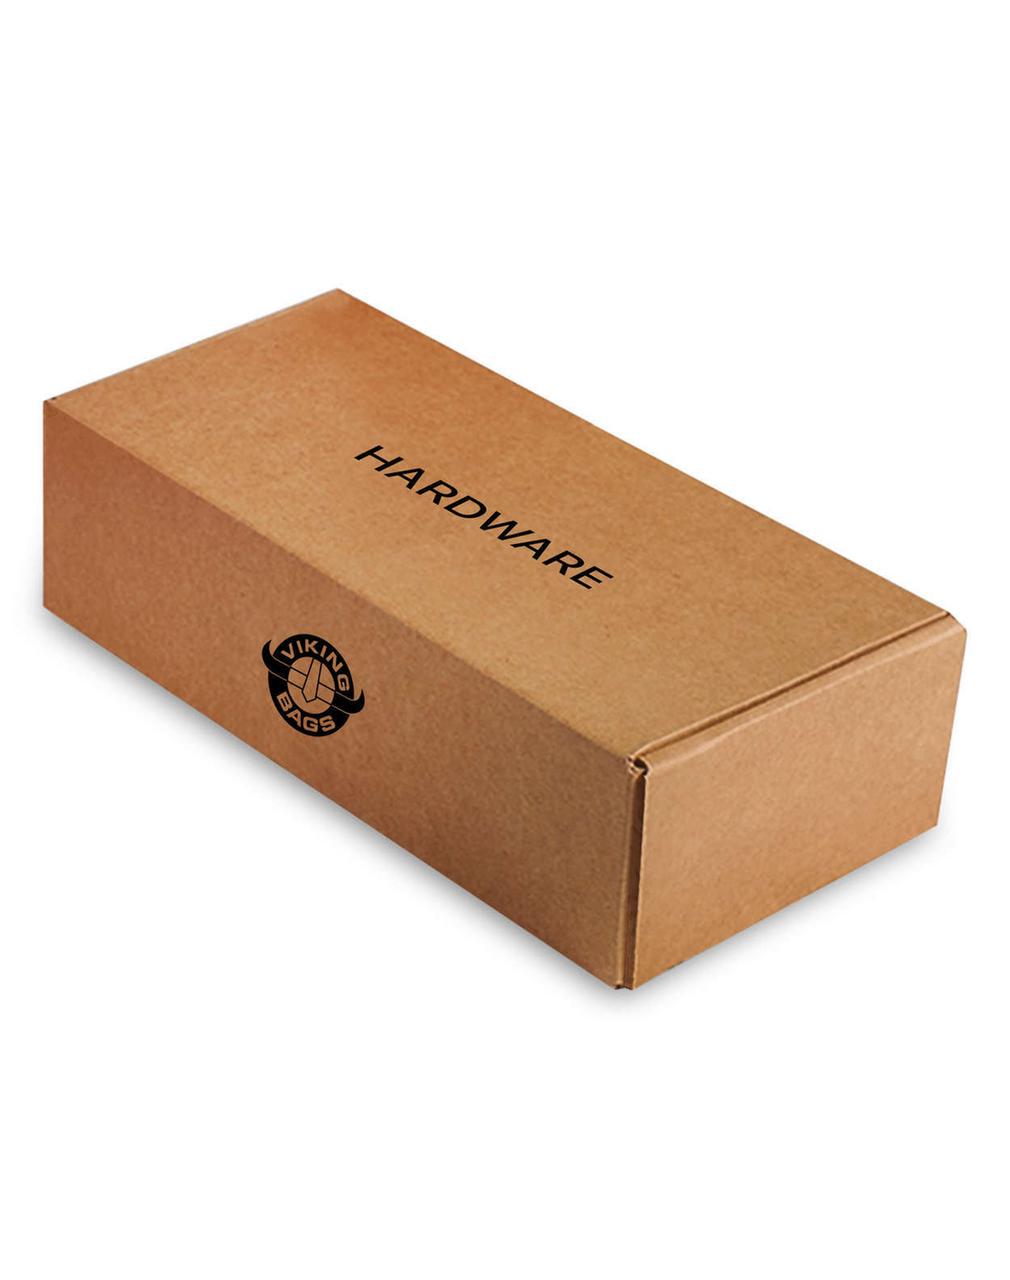 Triumph Thunderbird Viking Odin Medium Motorcycle Saddlebags Box